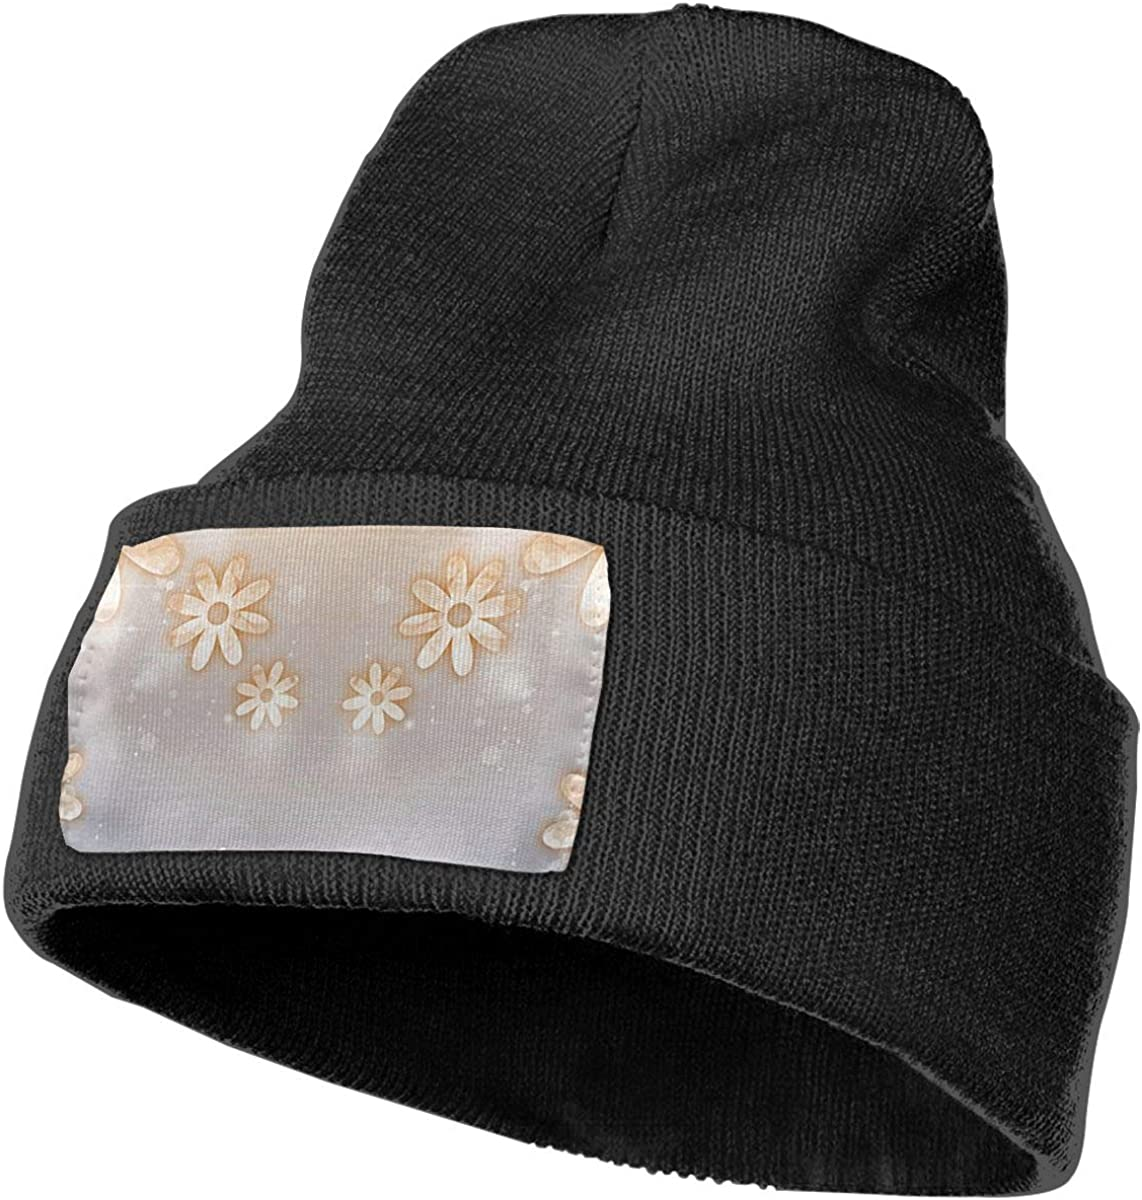 Ruin Flowers Fashion Knitting Hat for Men Women 100/% Acrylic Acid Mas Beanie Hat